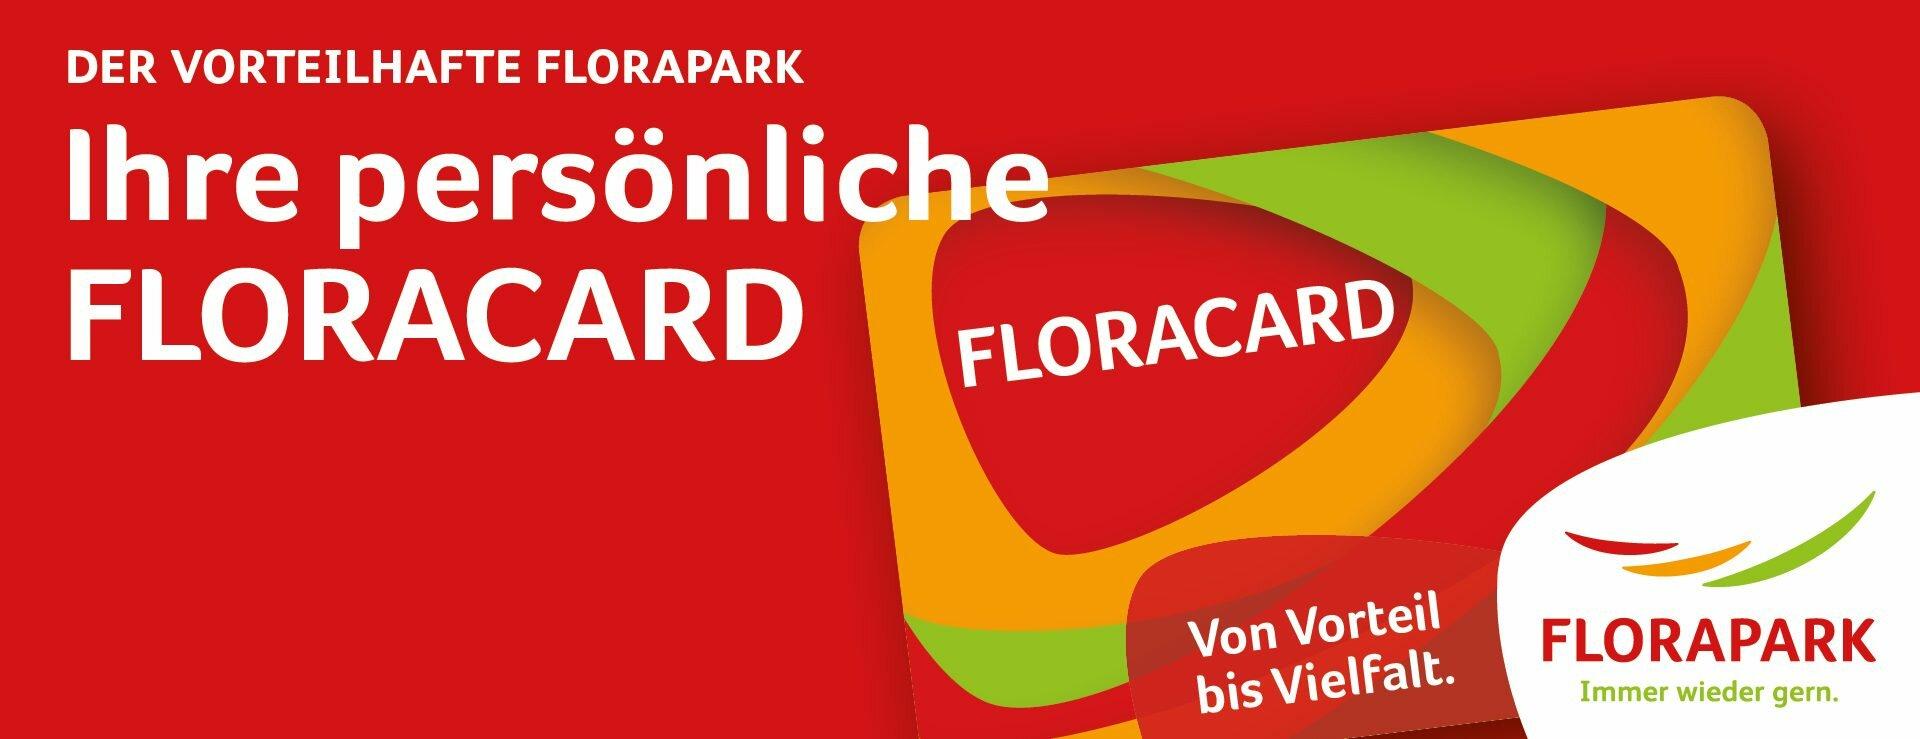 Das Center FLORACARD